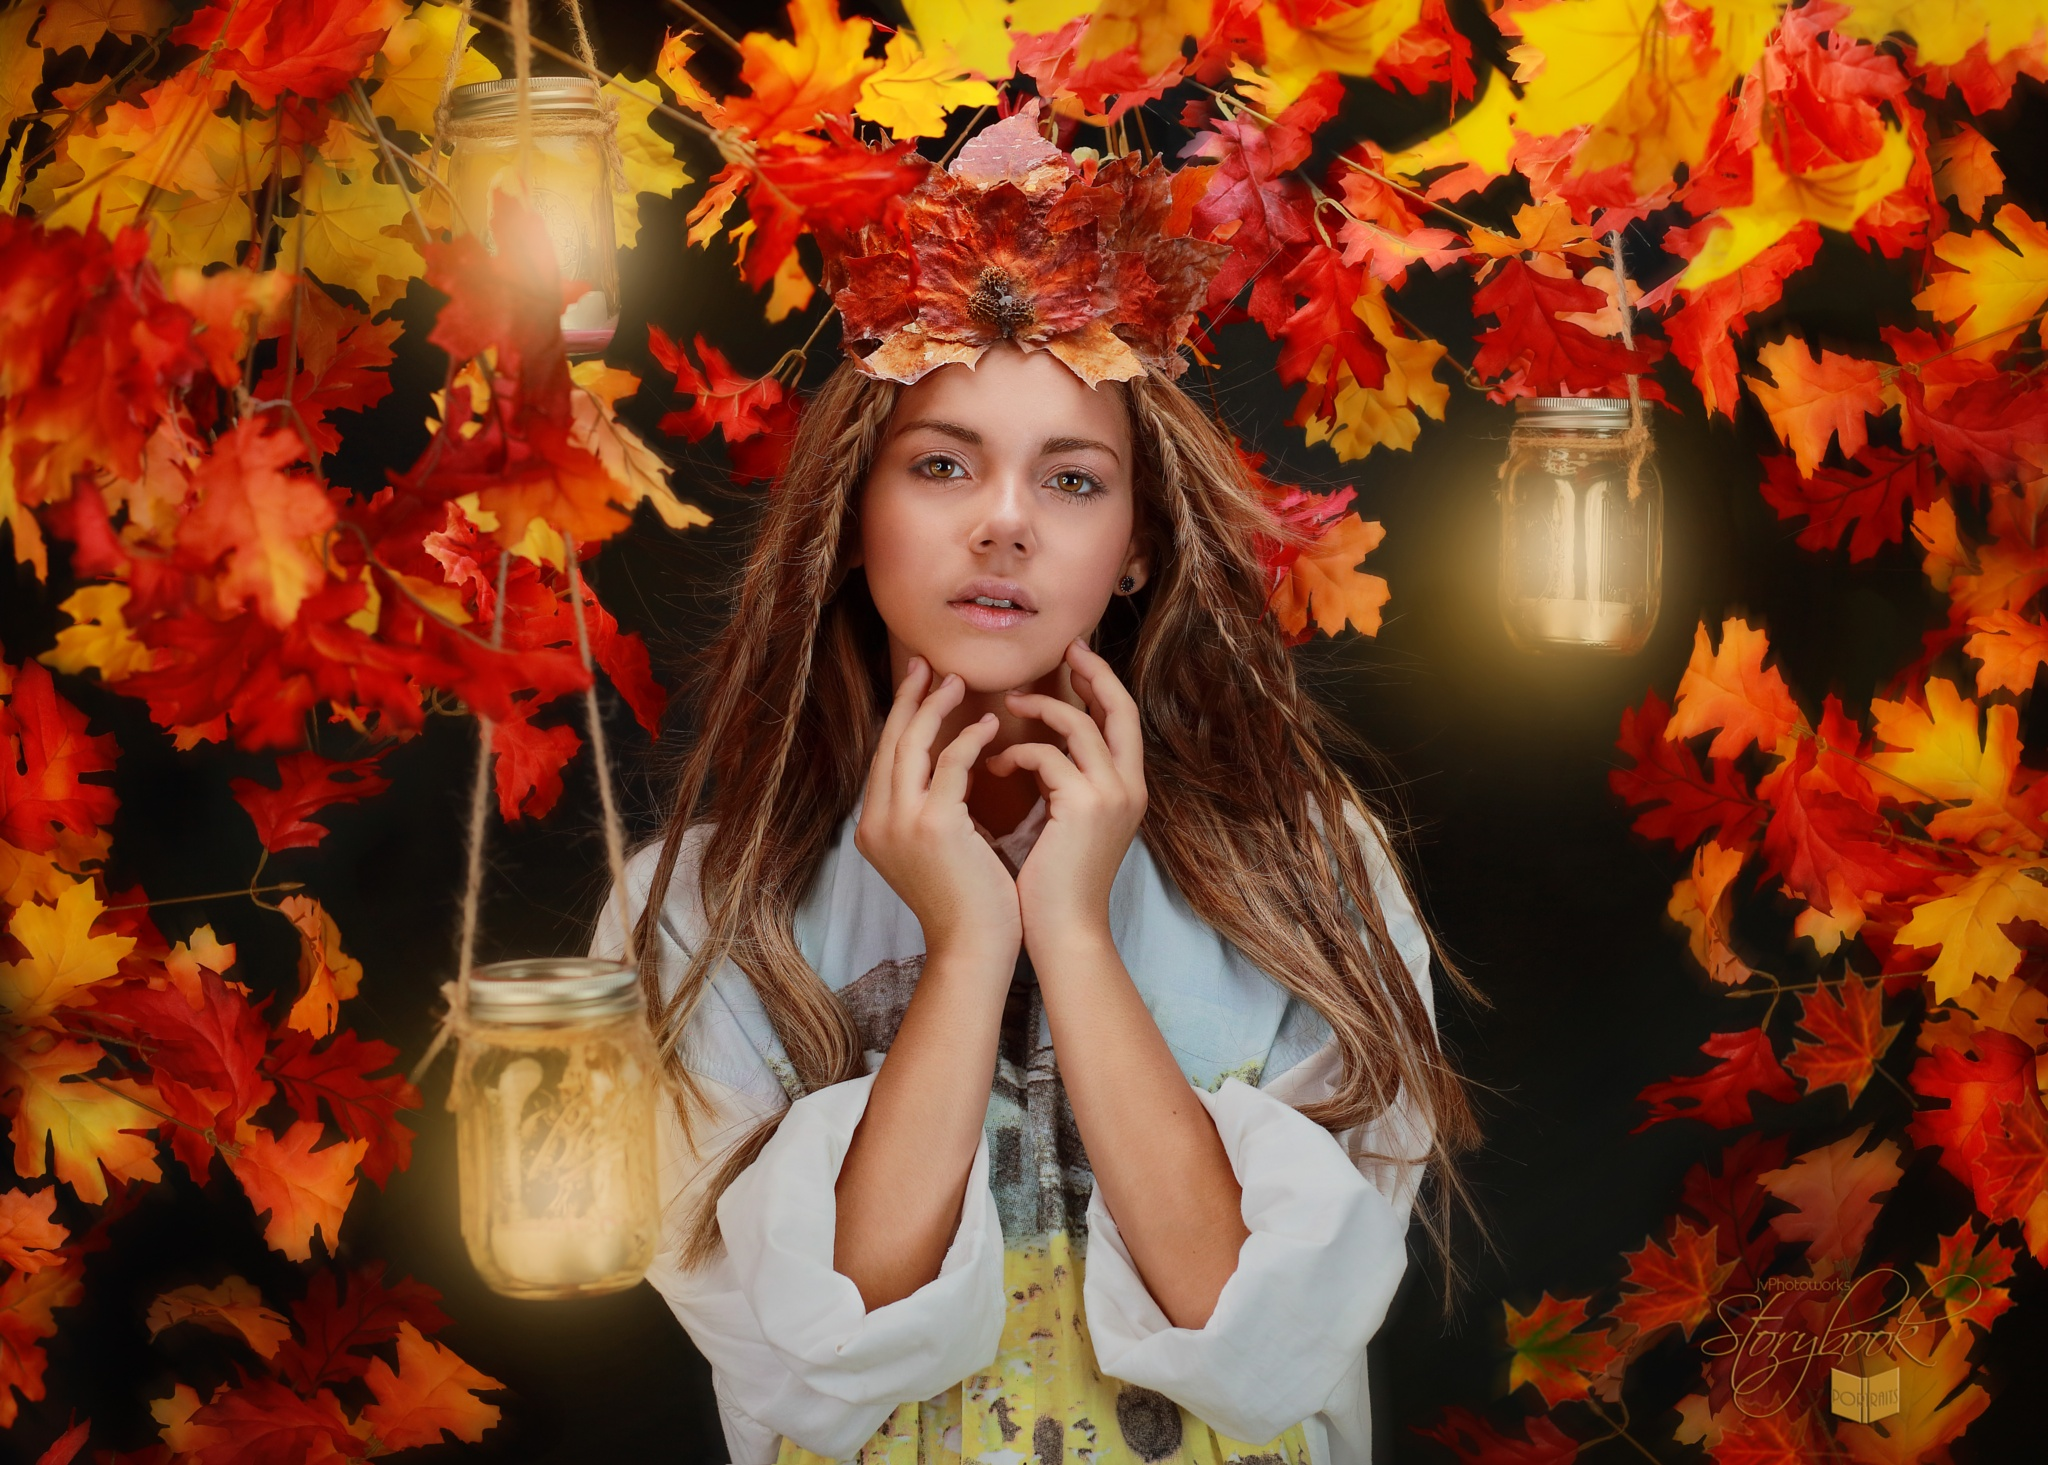 Autumn Leaves by Javier Vazquez